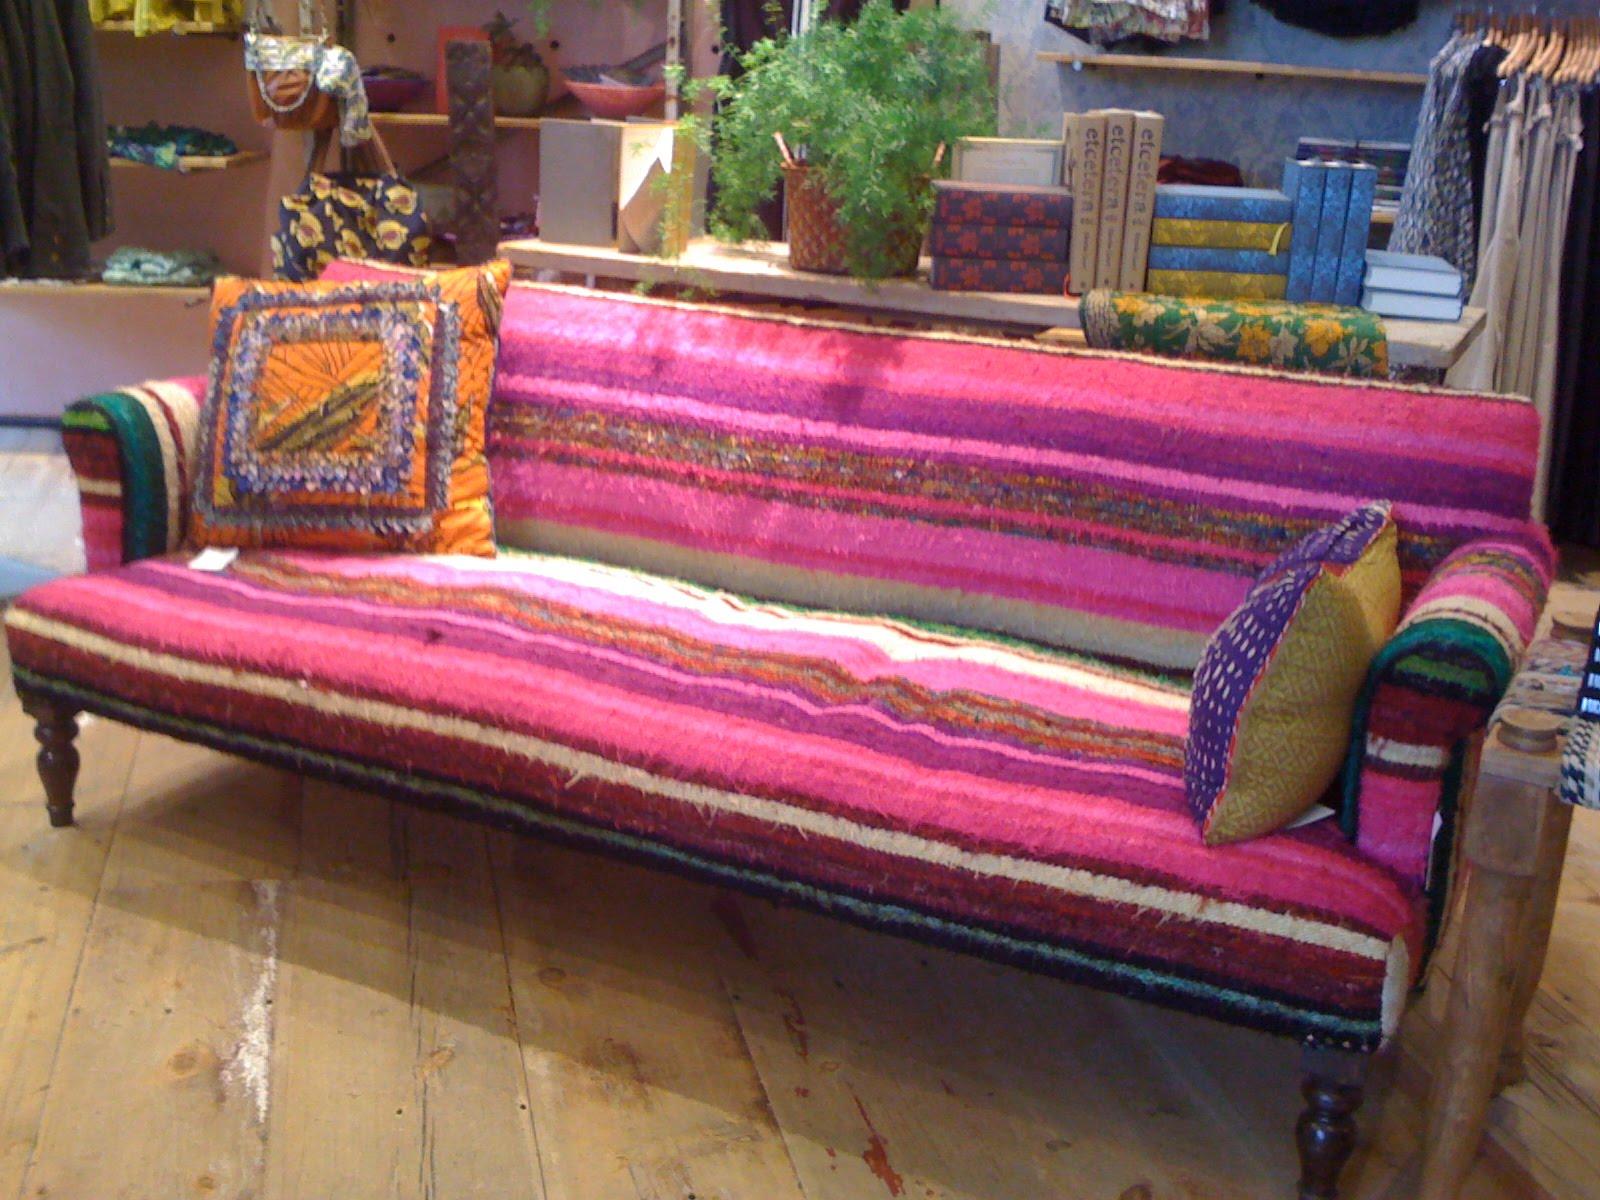 sofa farmers market san jose cleaning austin tx alamodeus objects dreinvention